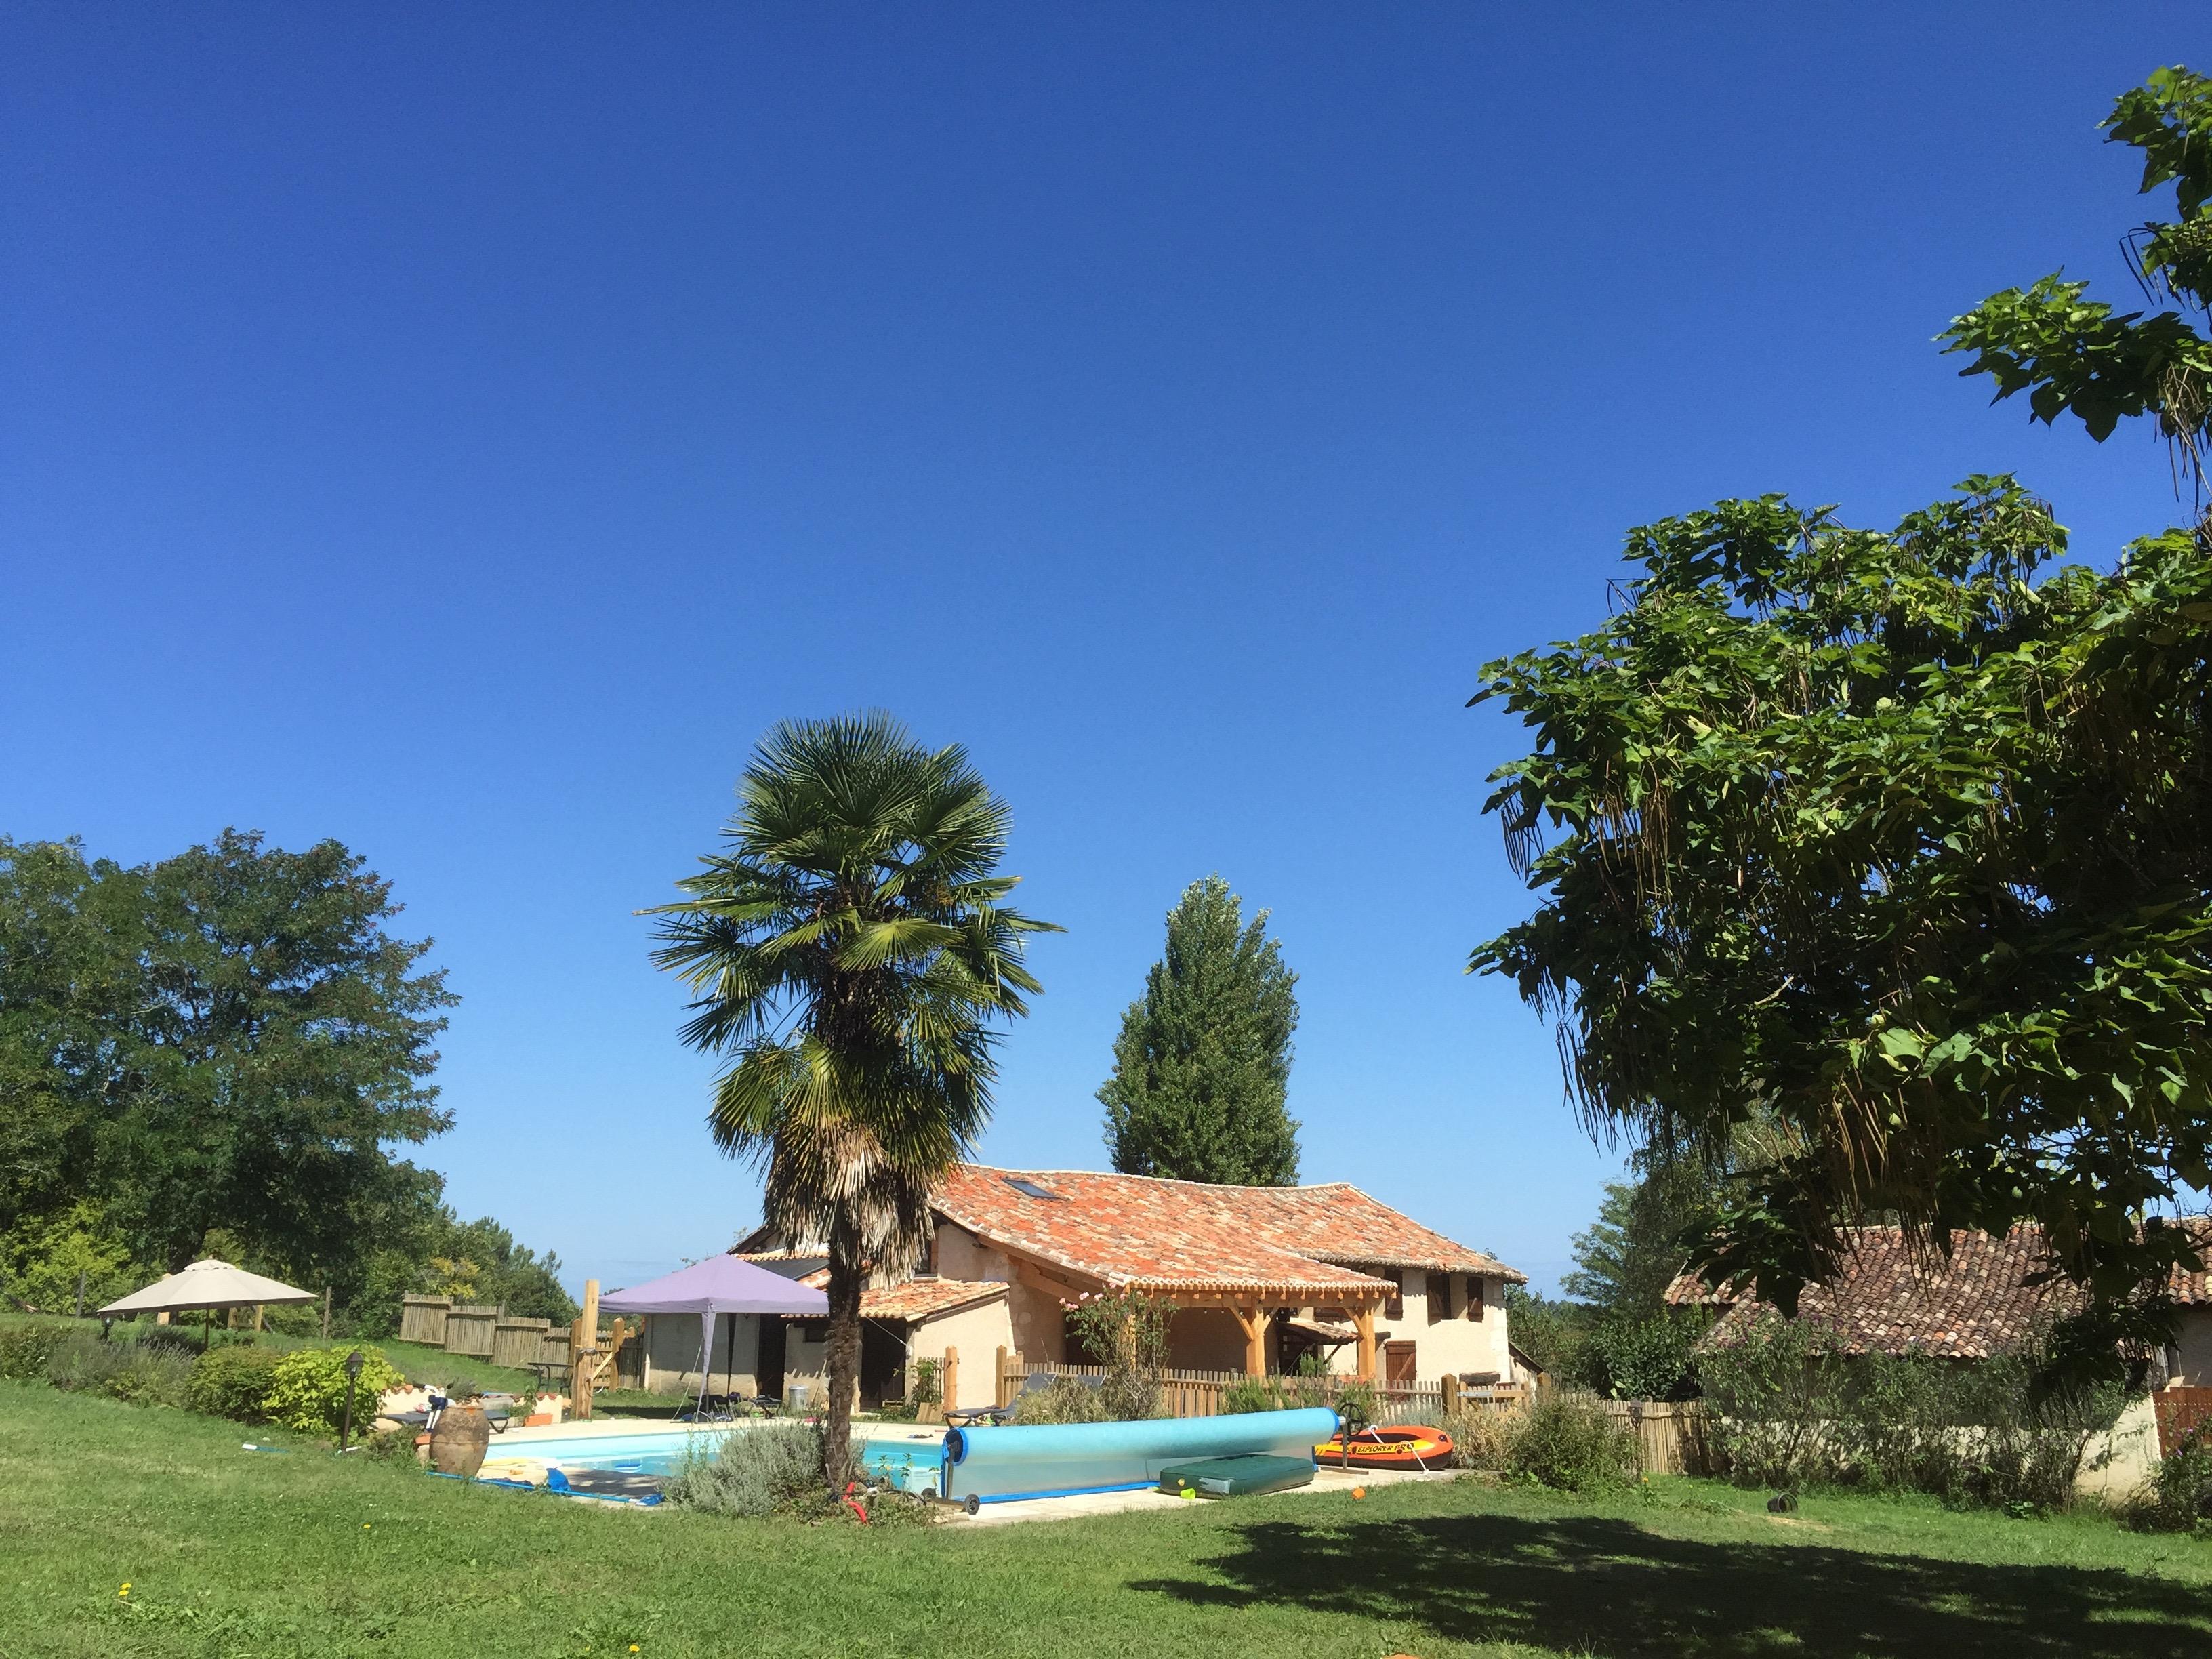 Le Fournet blue sky